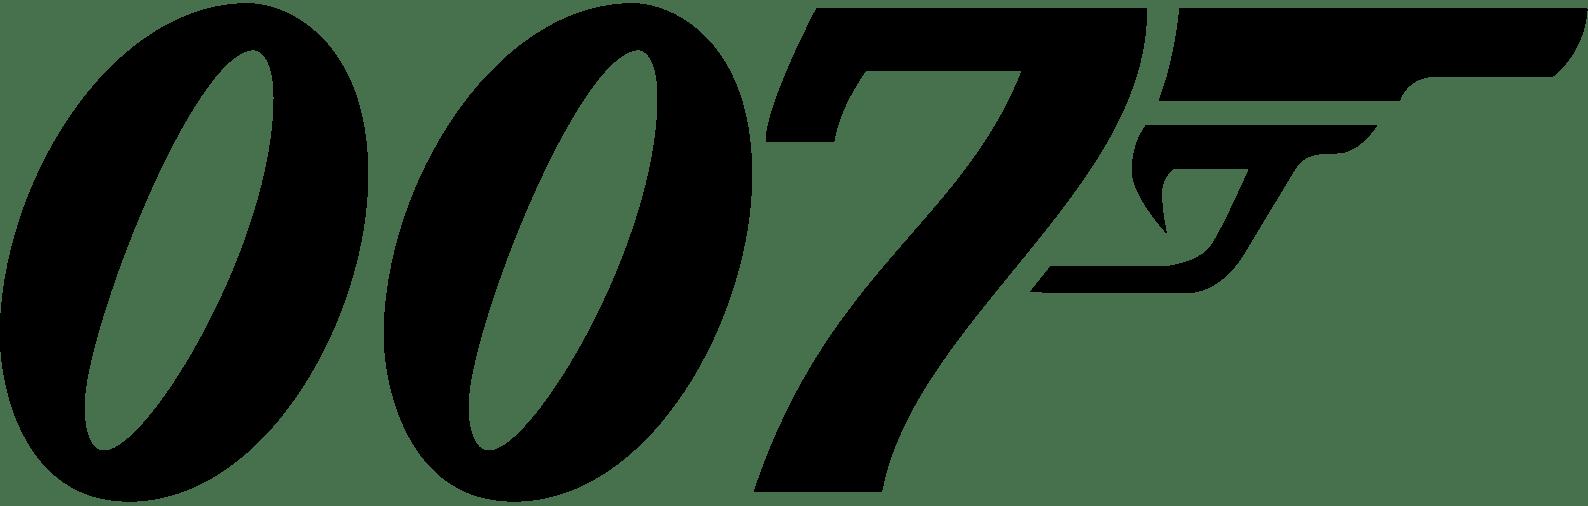 Bond 007 Series